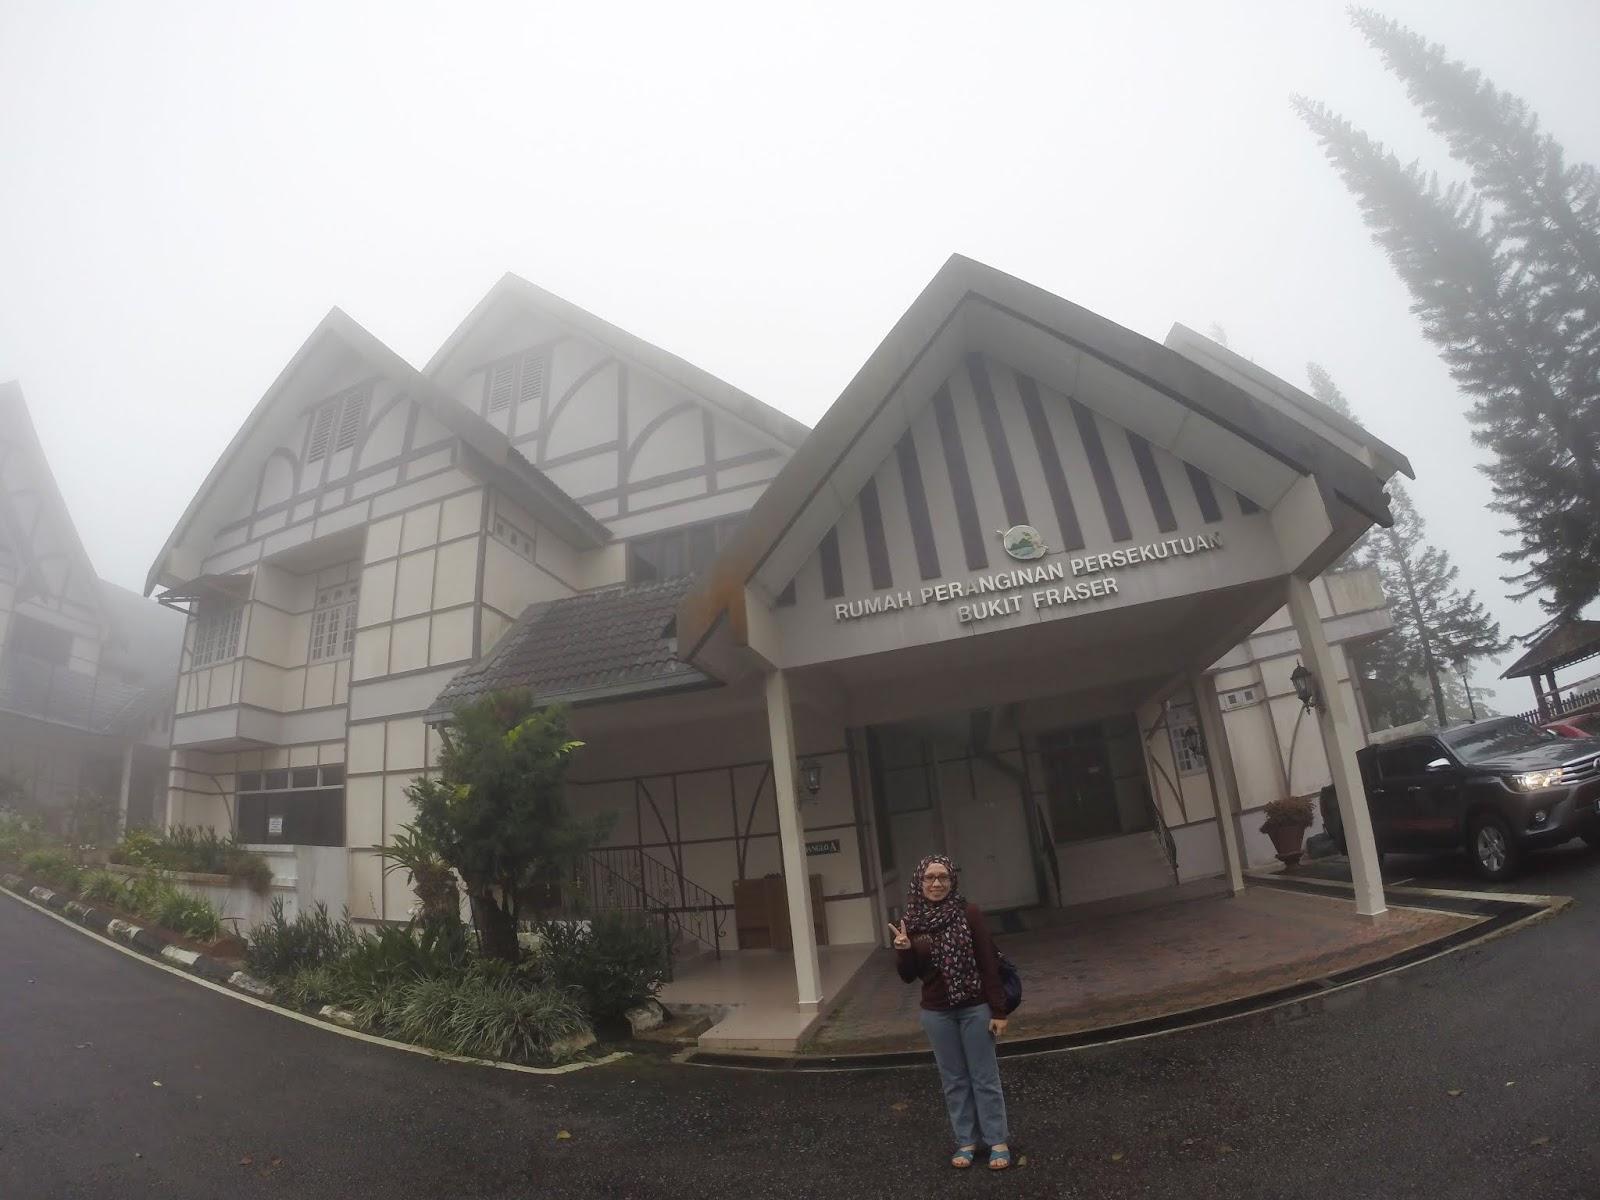 Scdha Sein Photo And Travel Kembara Pahang Rumah Peranginan Persekutuan Fraser Hills